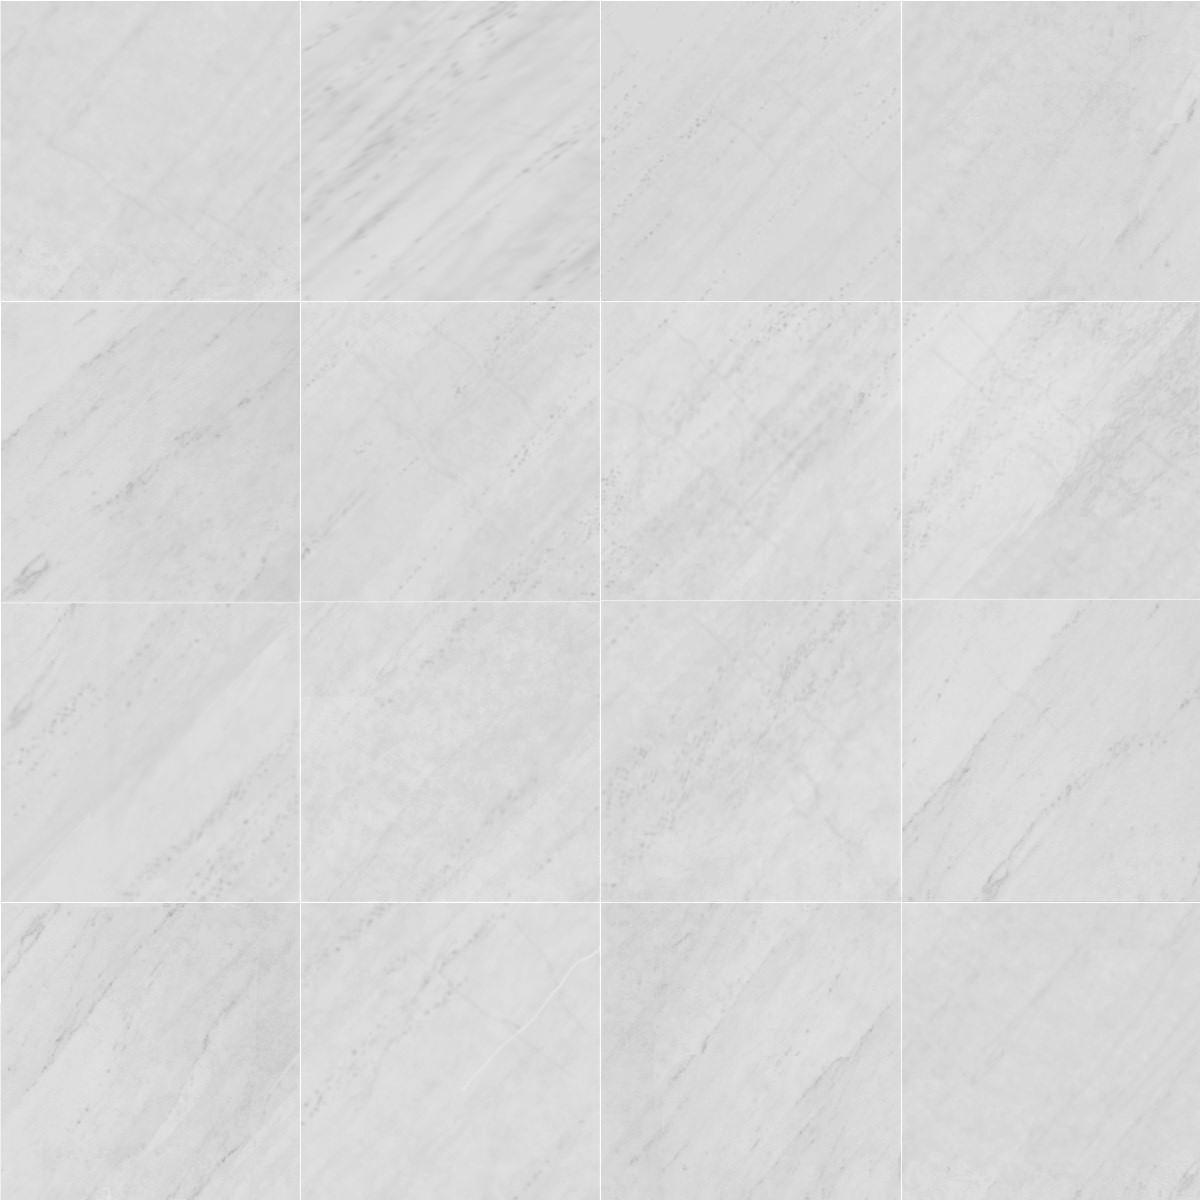 Swtexture Free Architectural Textures Gray Amp White